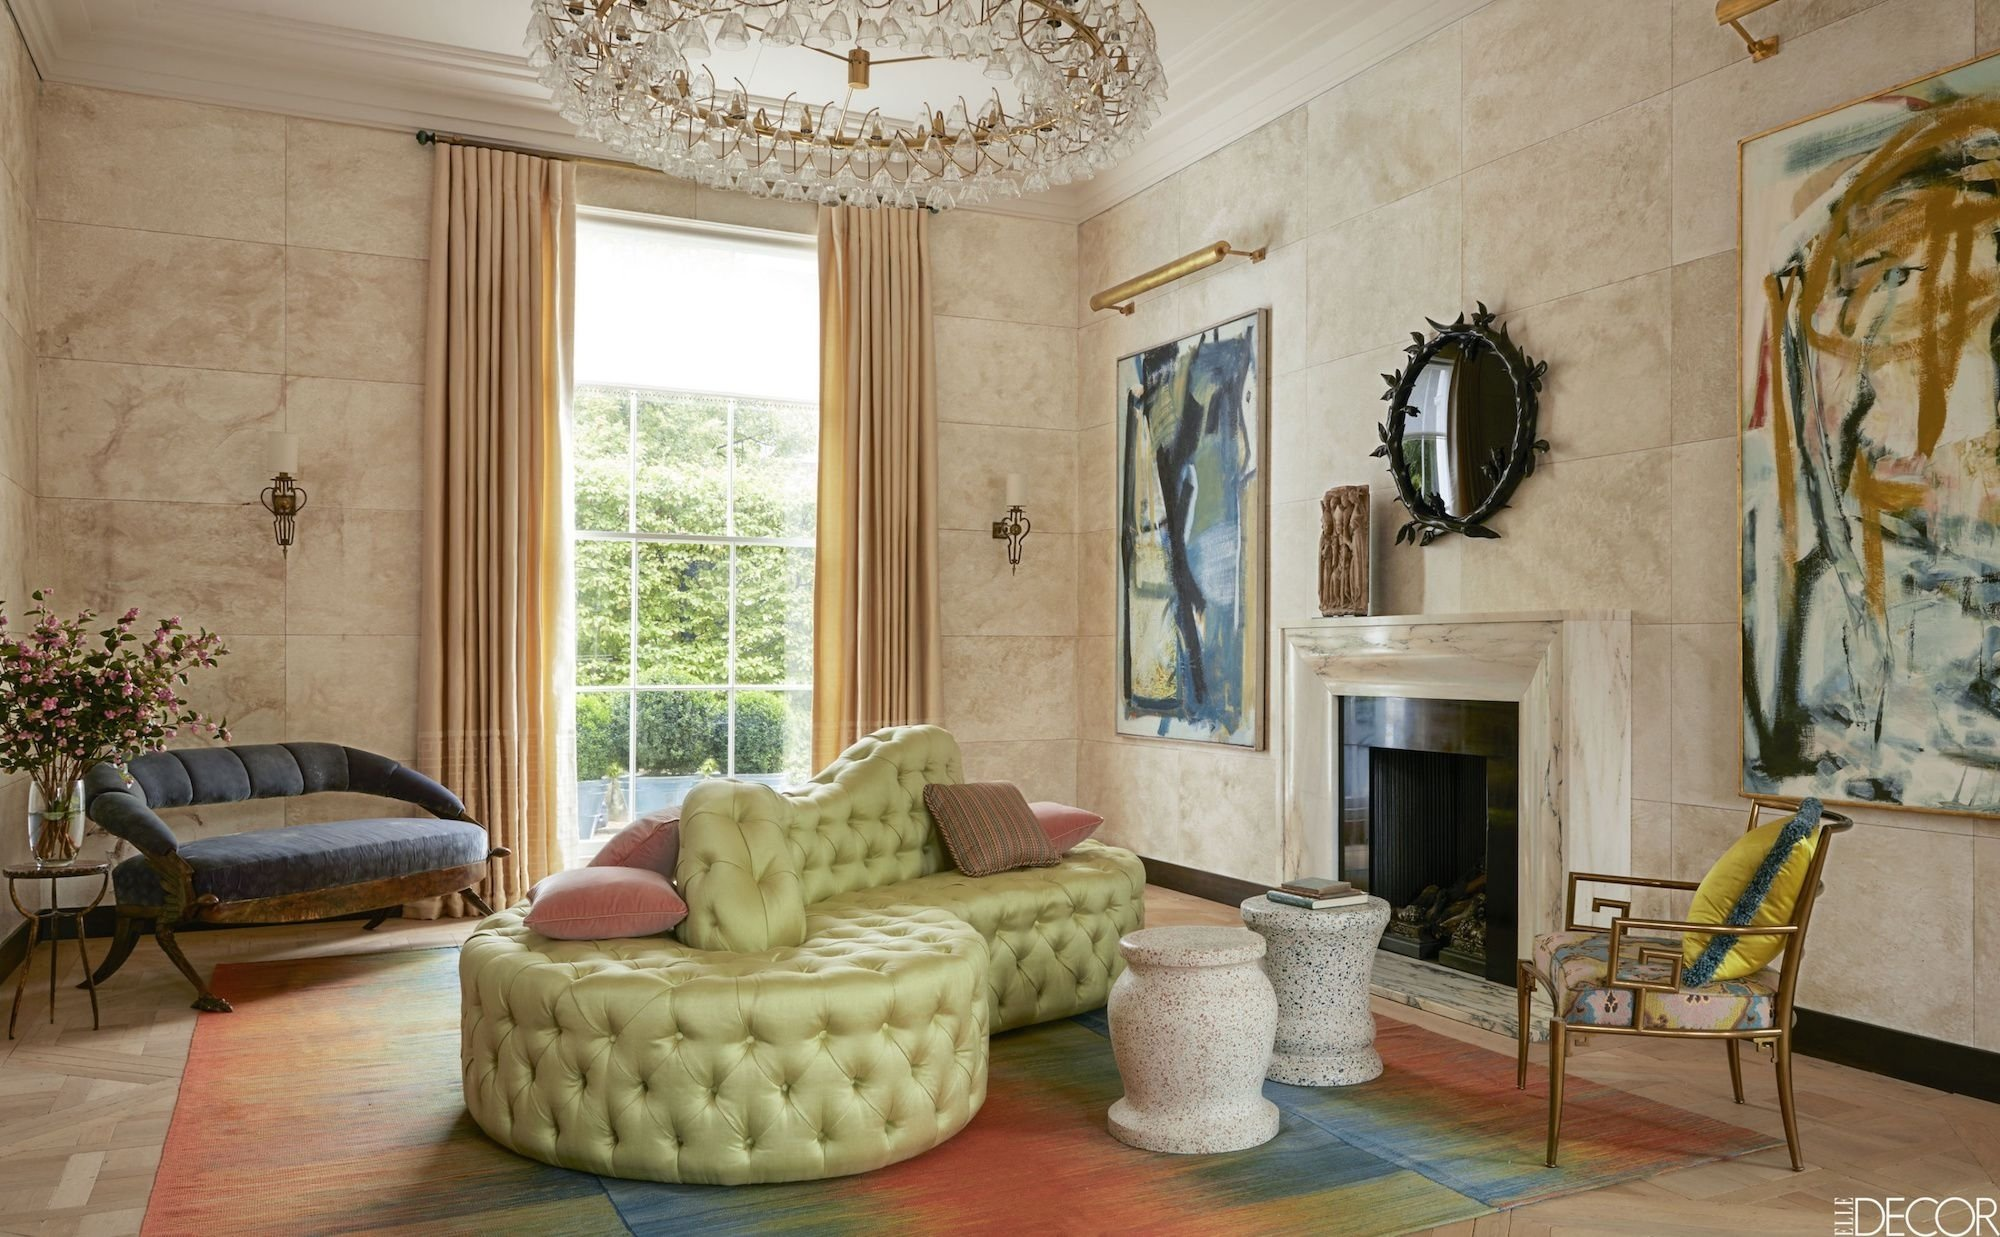 10 Spectacular Drapery Ideas For Living Room 40 living room curtains ideas window drapes for living rooms 2 2020